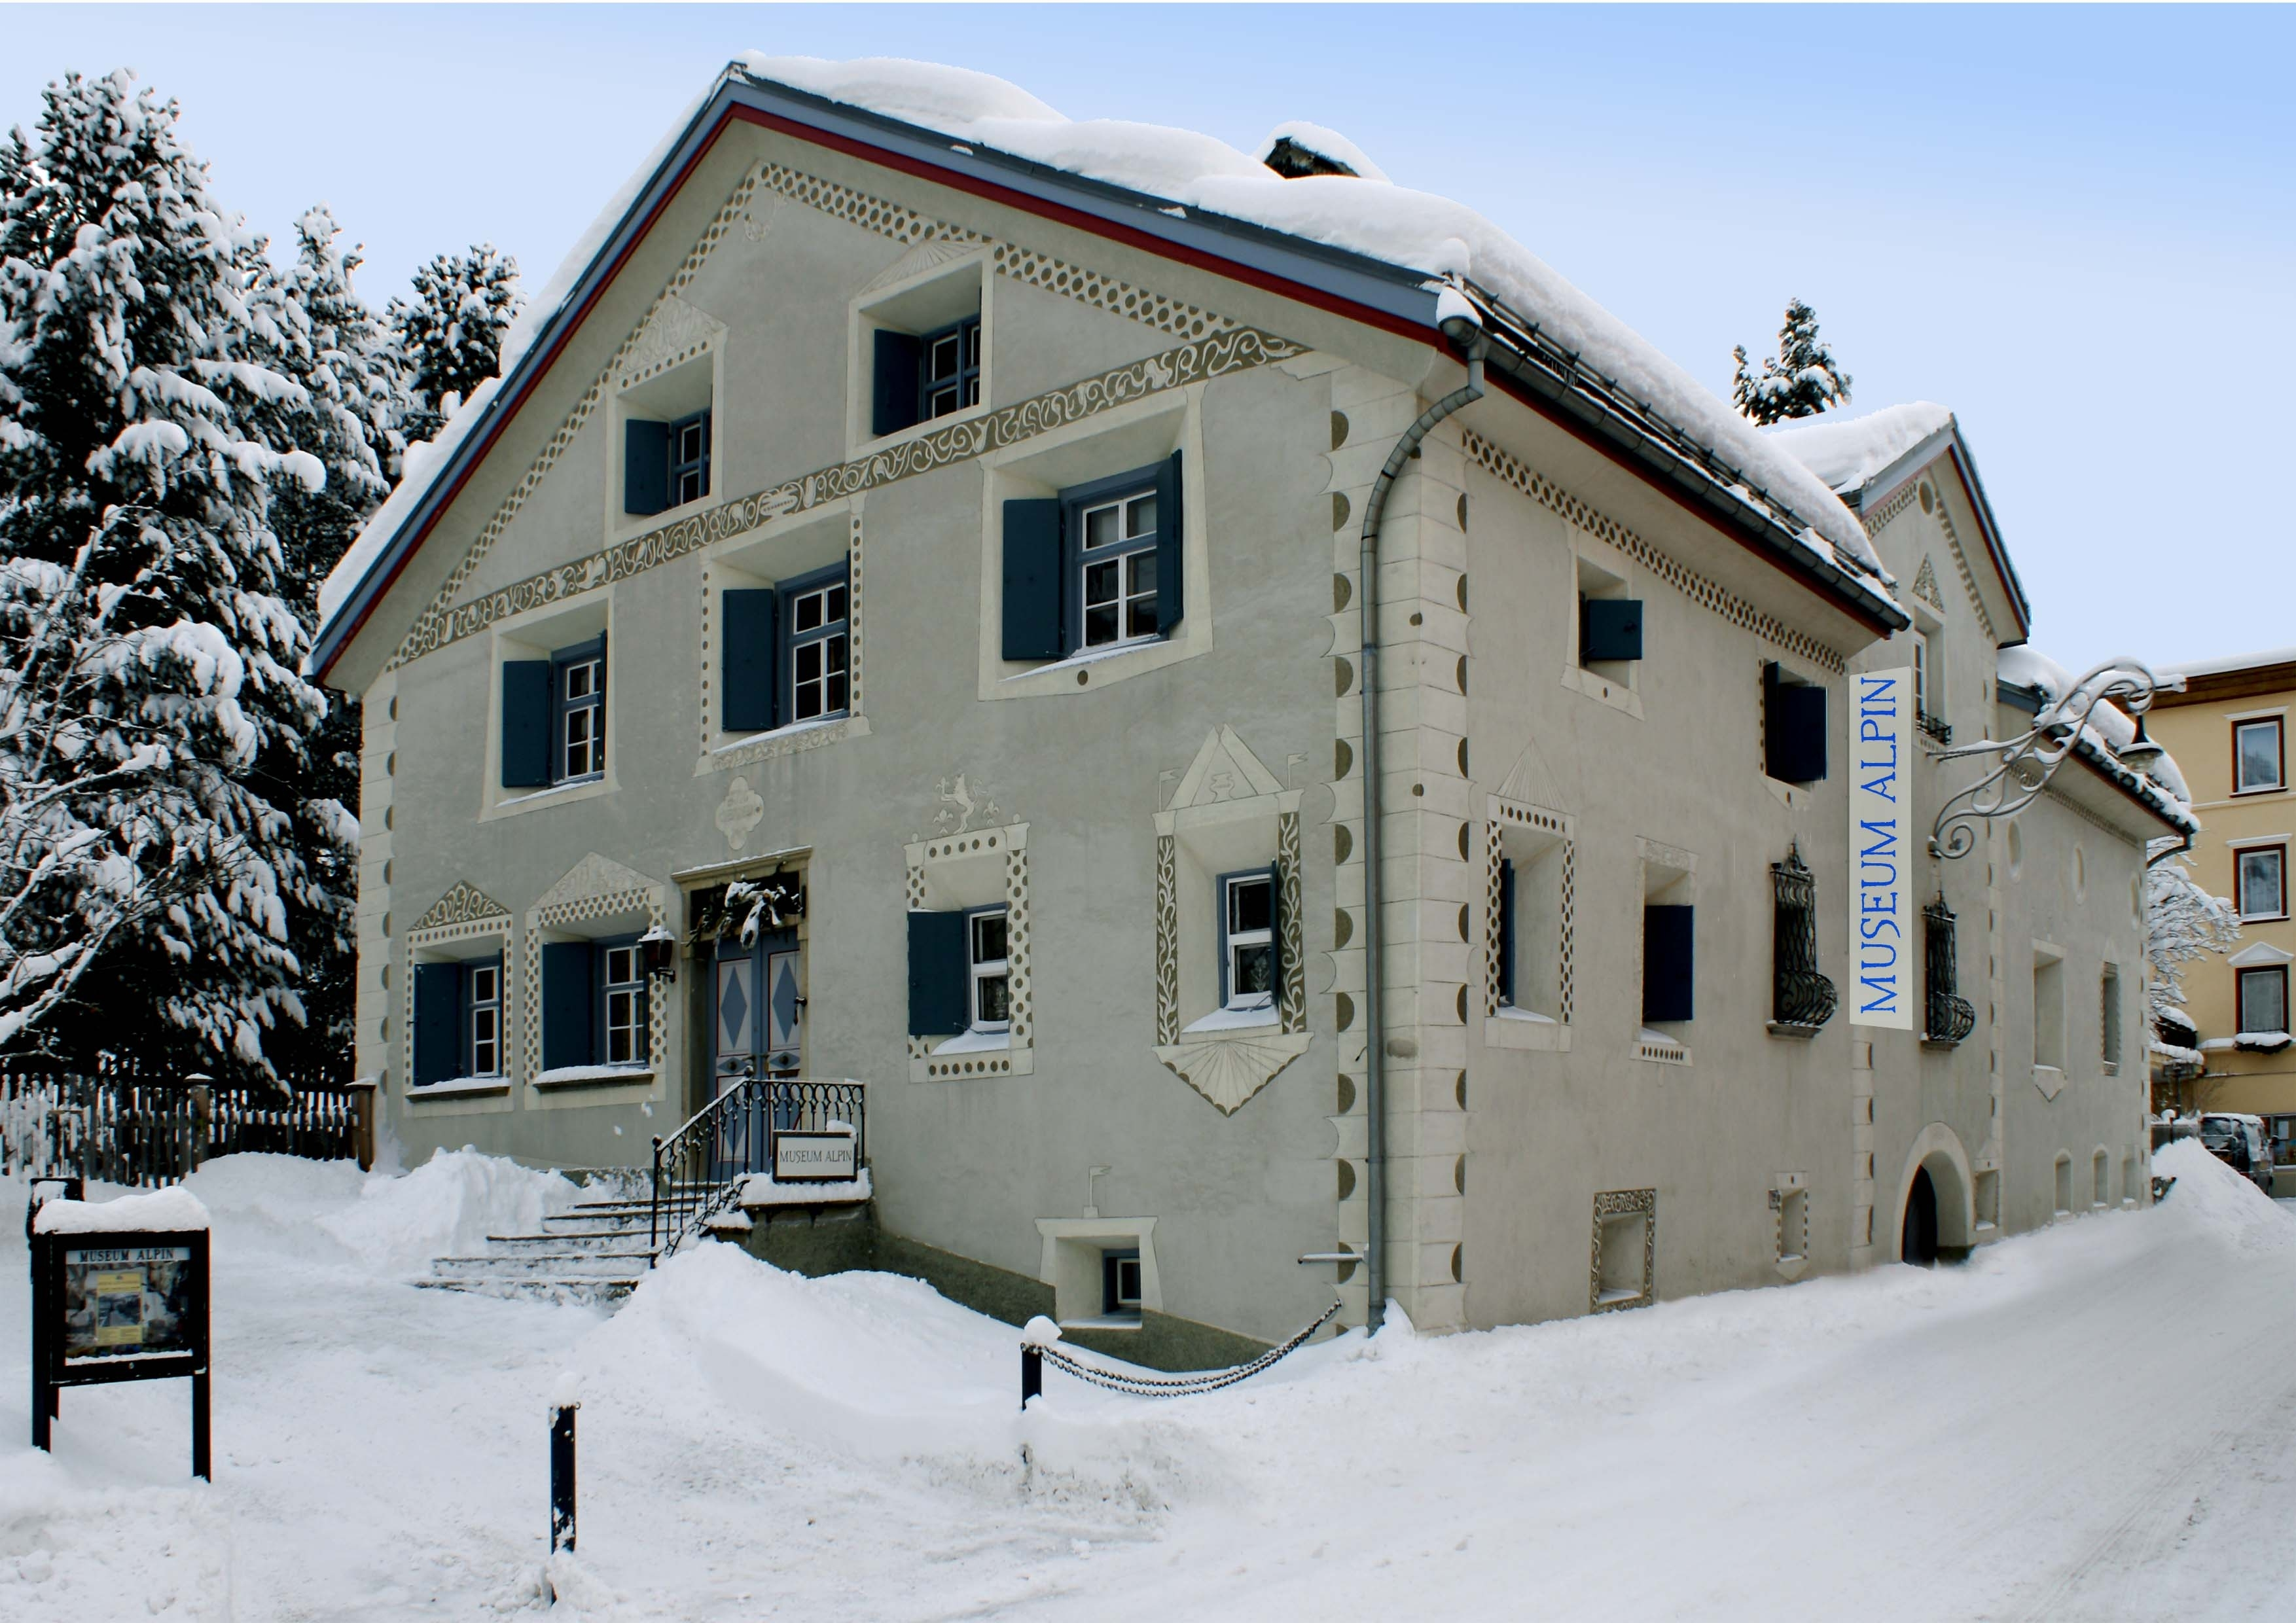 SAC Bibliothek, Museum Alpin Slide 1